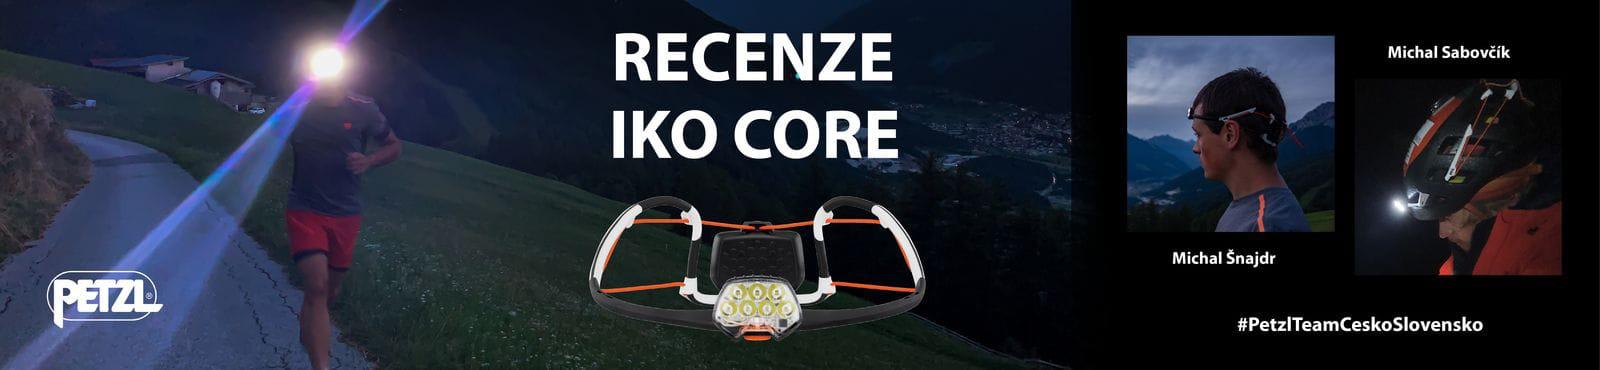 Čelovka Iko Core